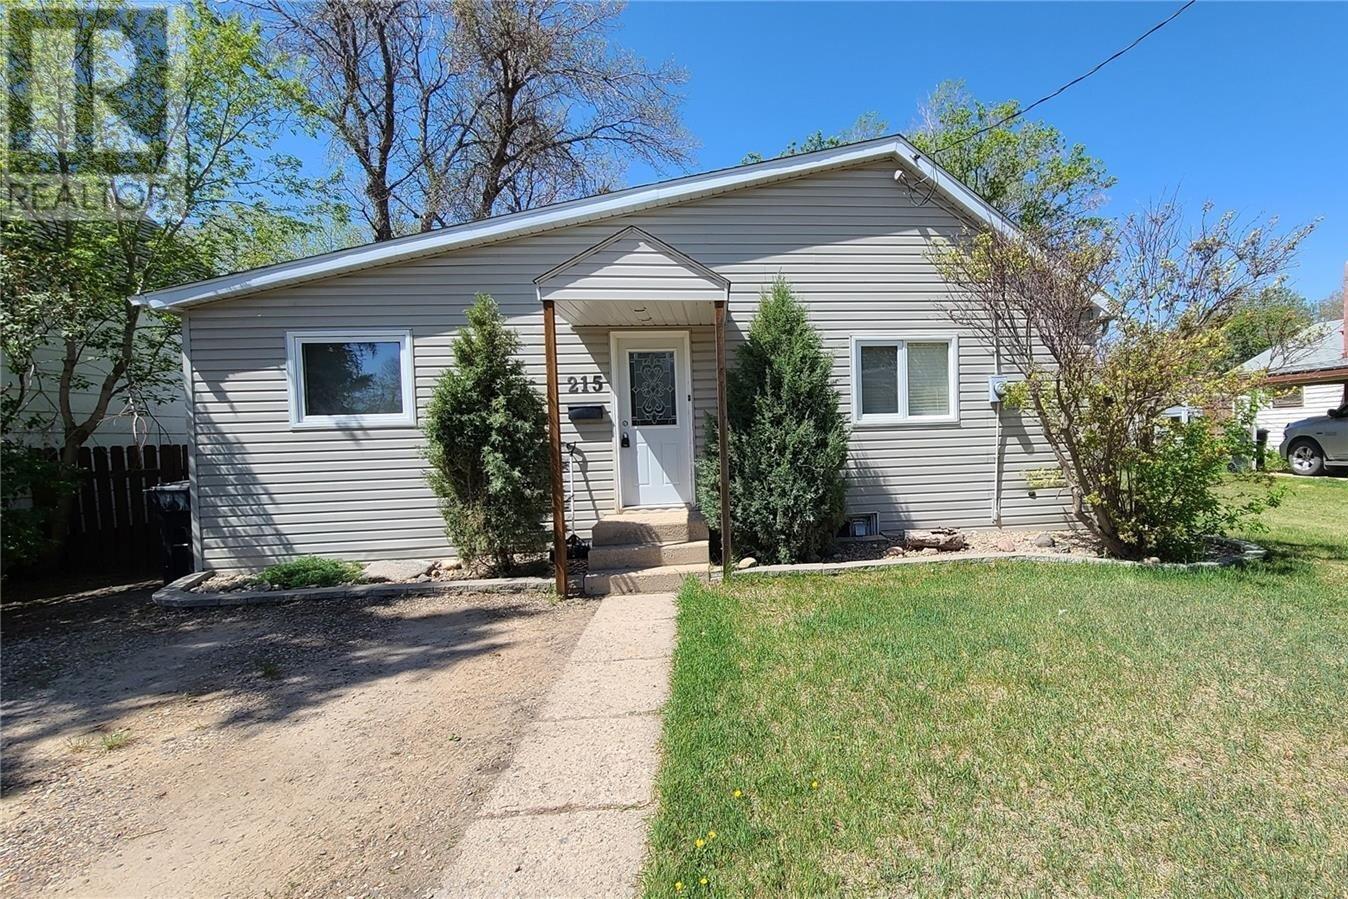 House for sale at 215 Mergens St Weyburn Saskatchewan - MLS: SK839029